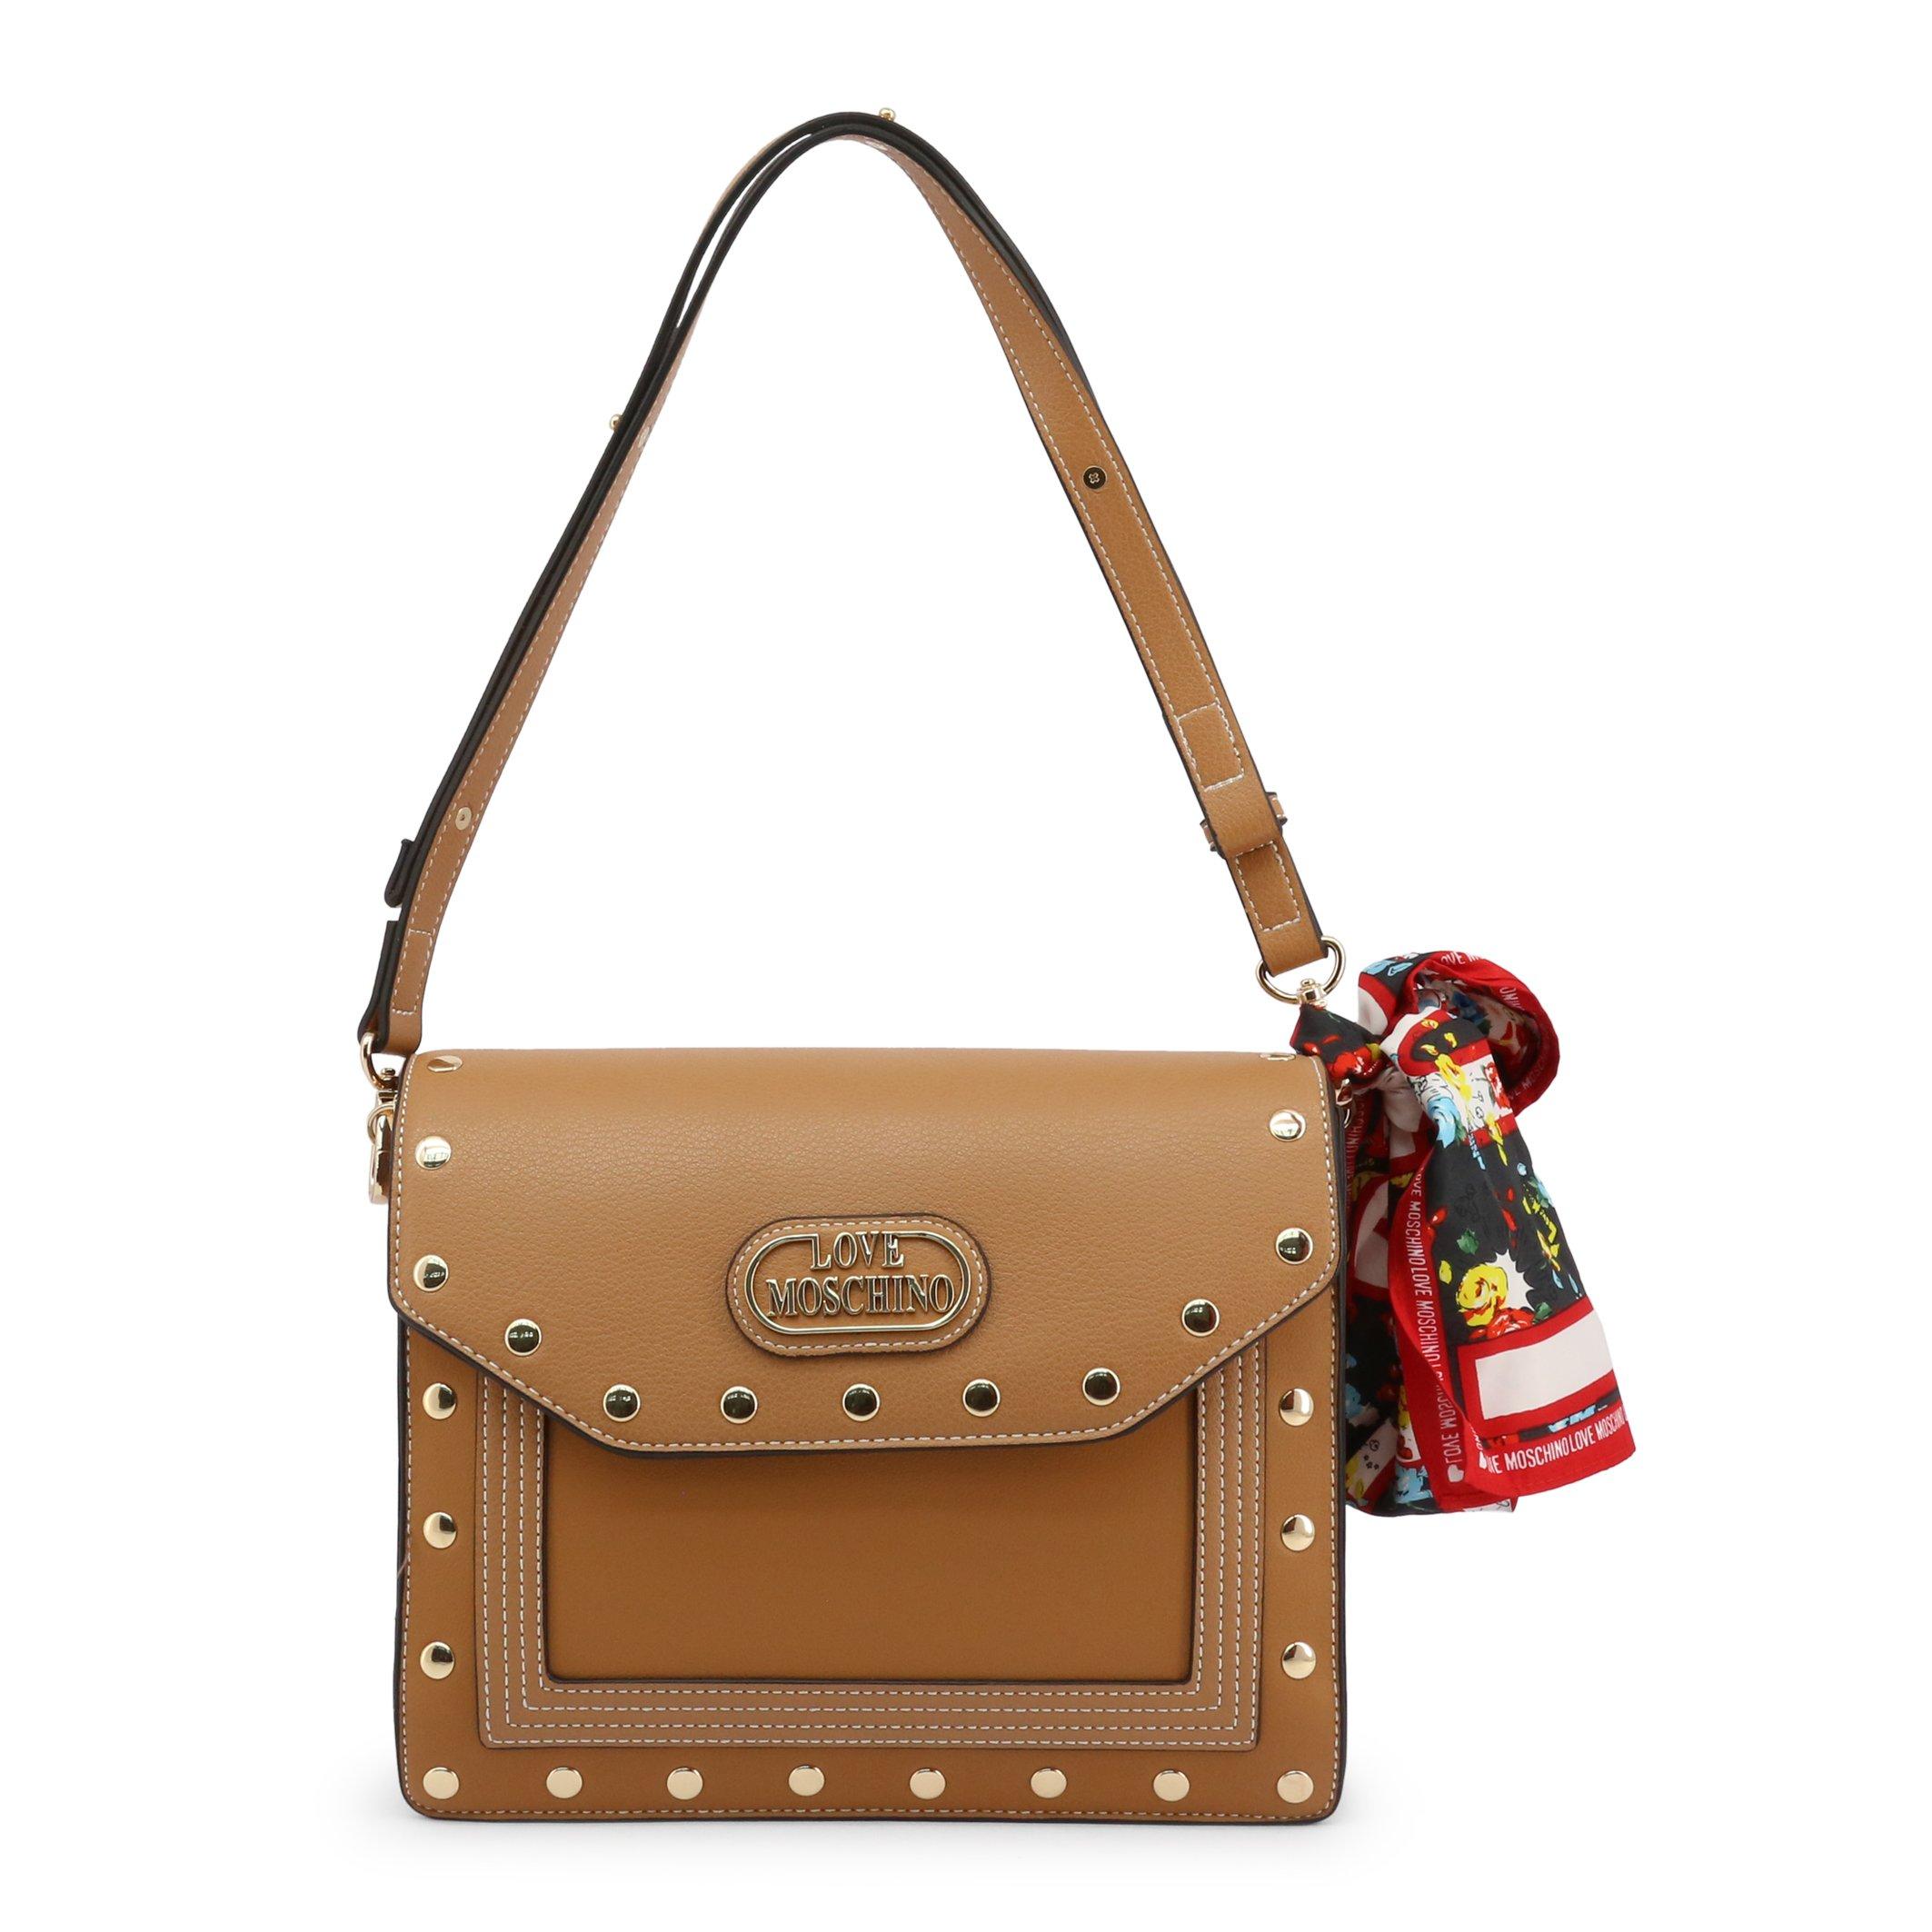 Love Moschino Women's Shoulder Bag Black JC4043PP1CLE1 - brown NOSIZE